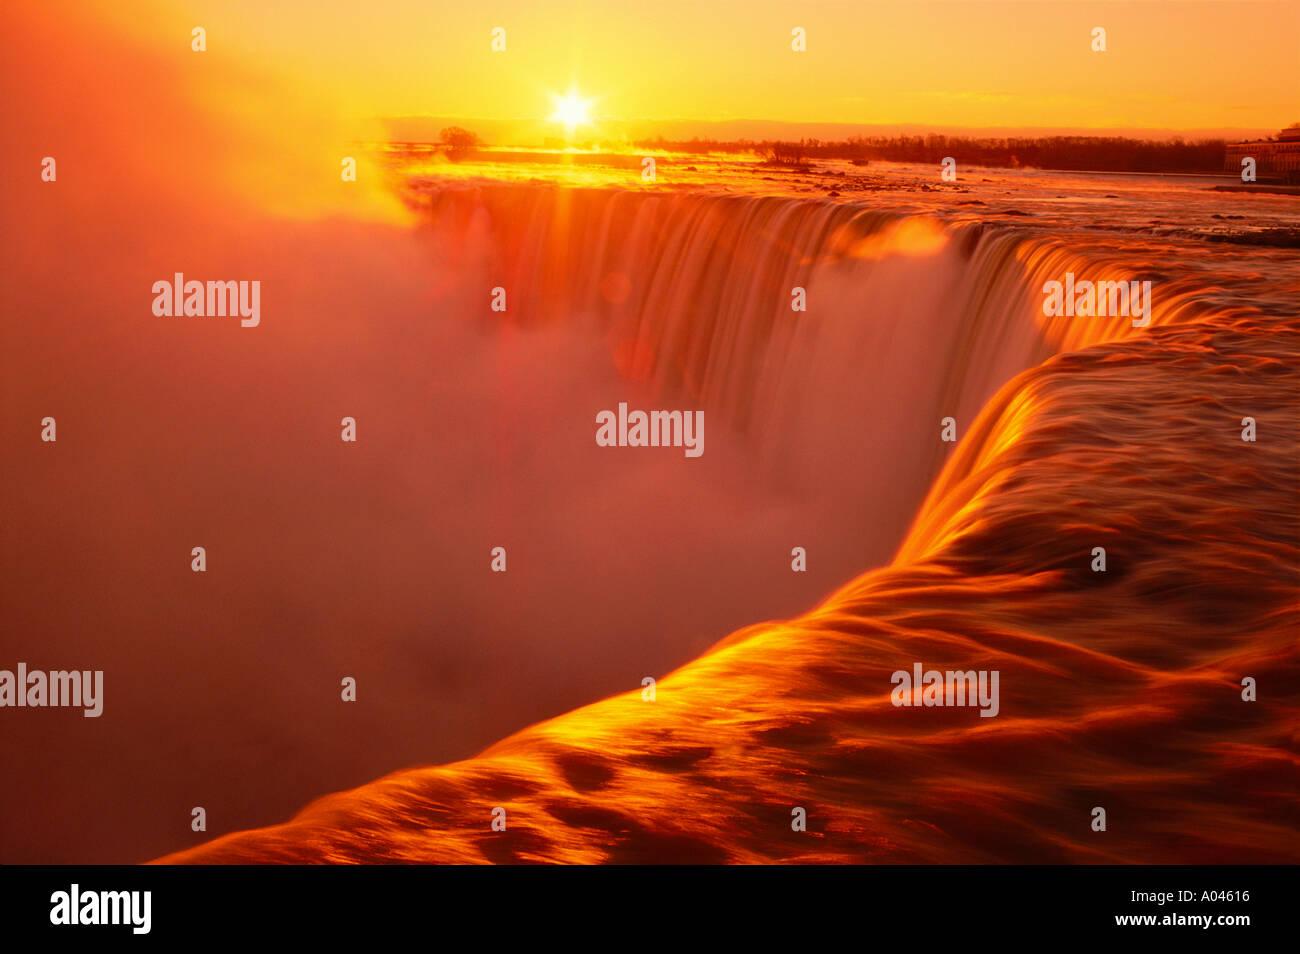 Canada Ontario Niagara Falls Niagara Falls au lever du soleil Photo Stock